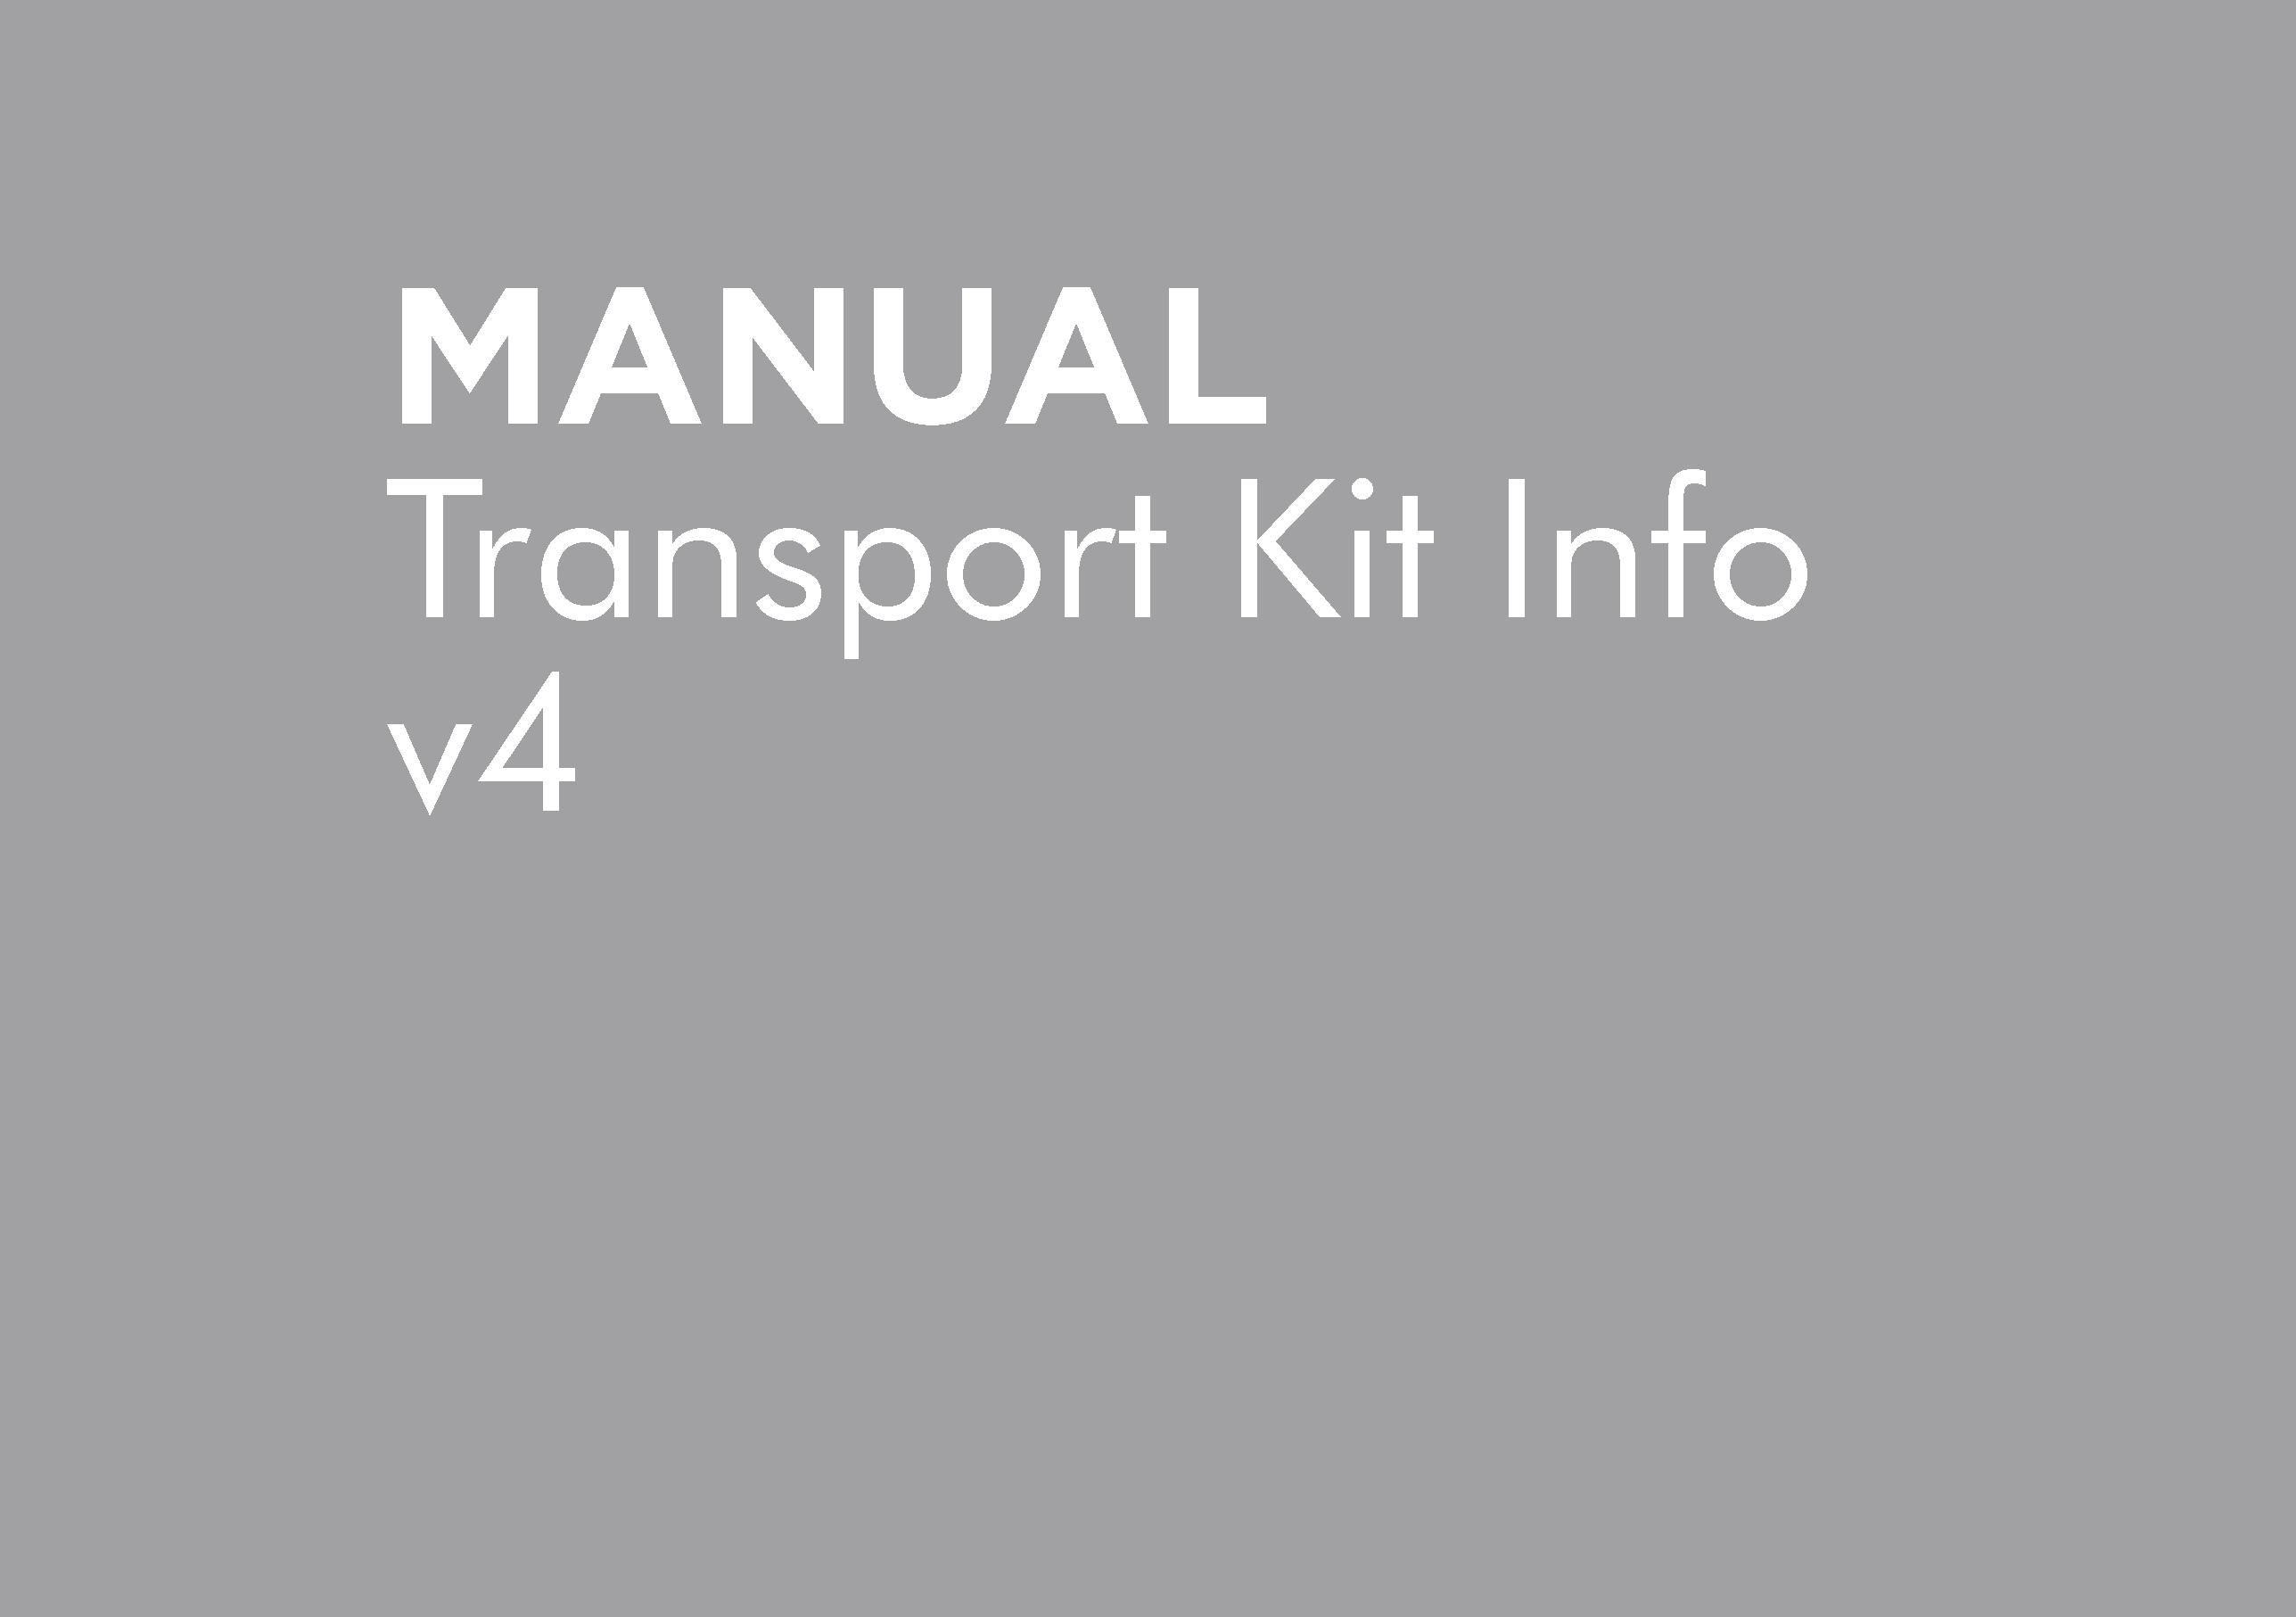 BT-OMWEED-MP375 – WEEDIT TRANSPORT KIT INFO V4